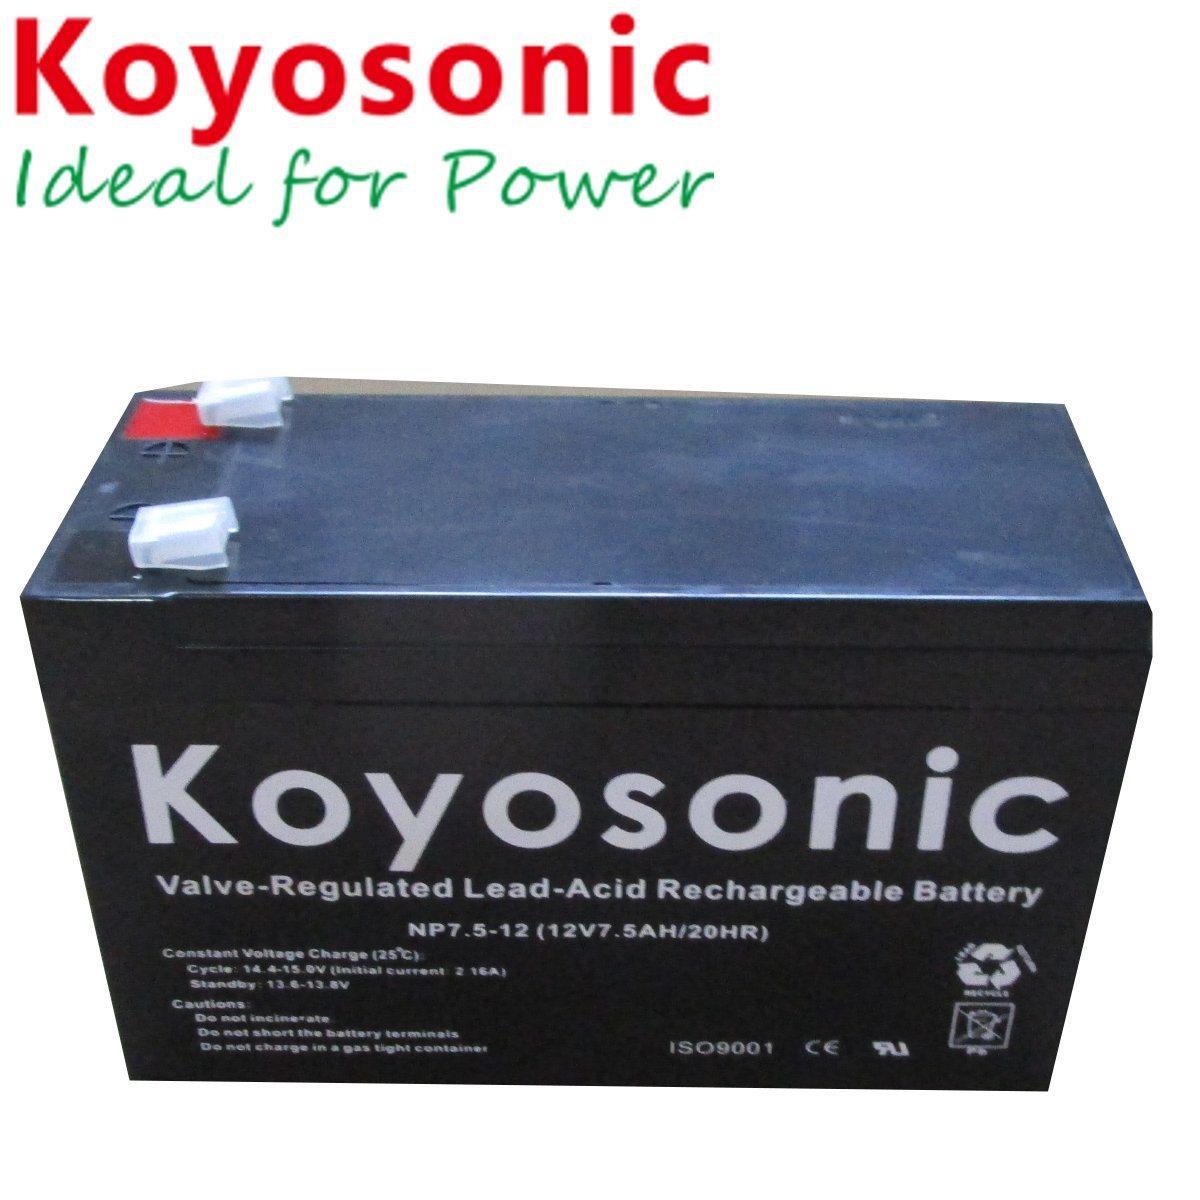 [Hot Item] 12V 7ah UPS Battery Price 12V 7ah 20 Hr Battery Dry Cell Battery  UPS